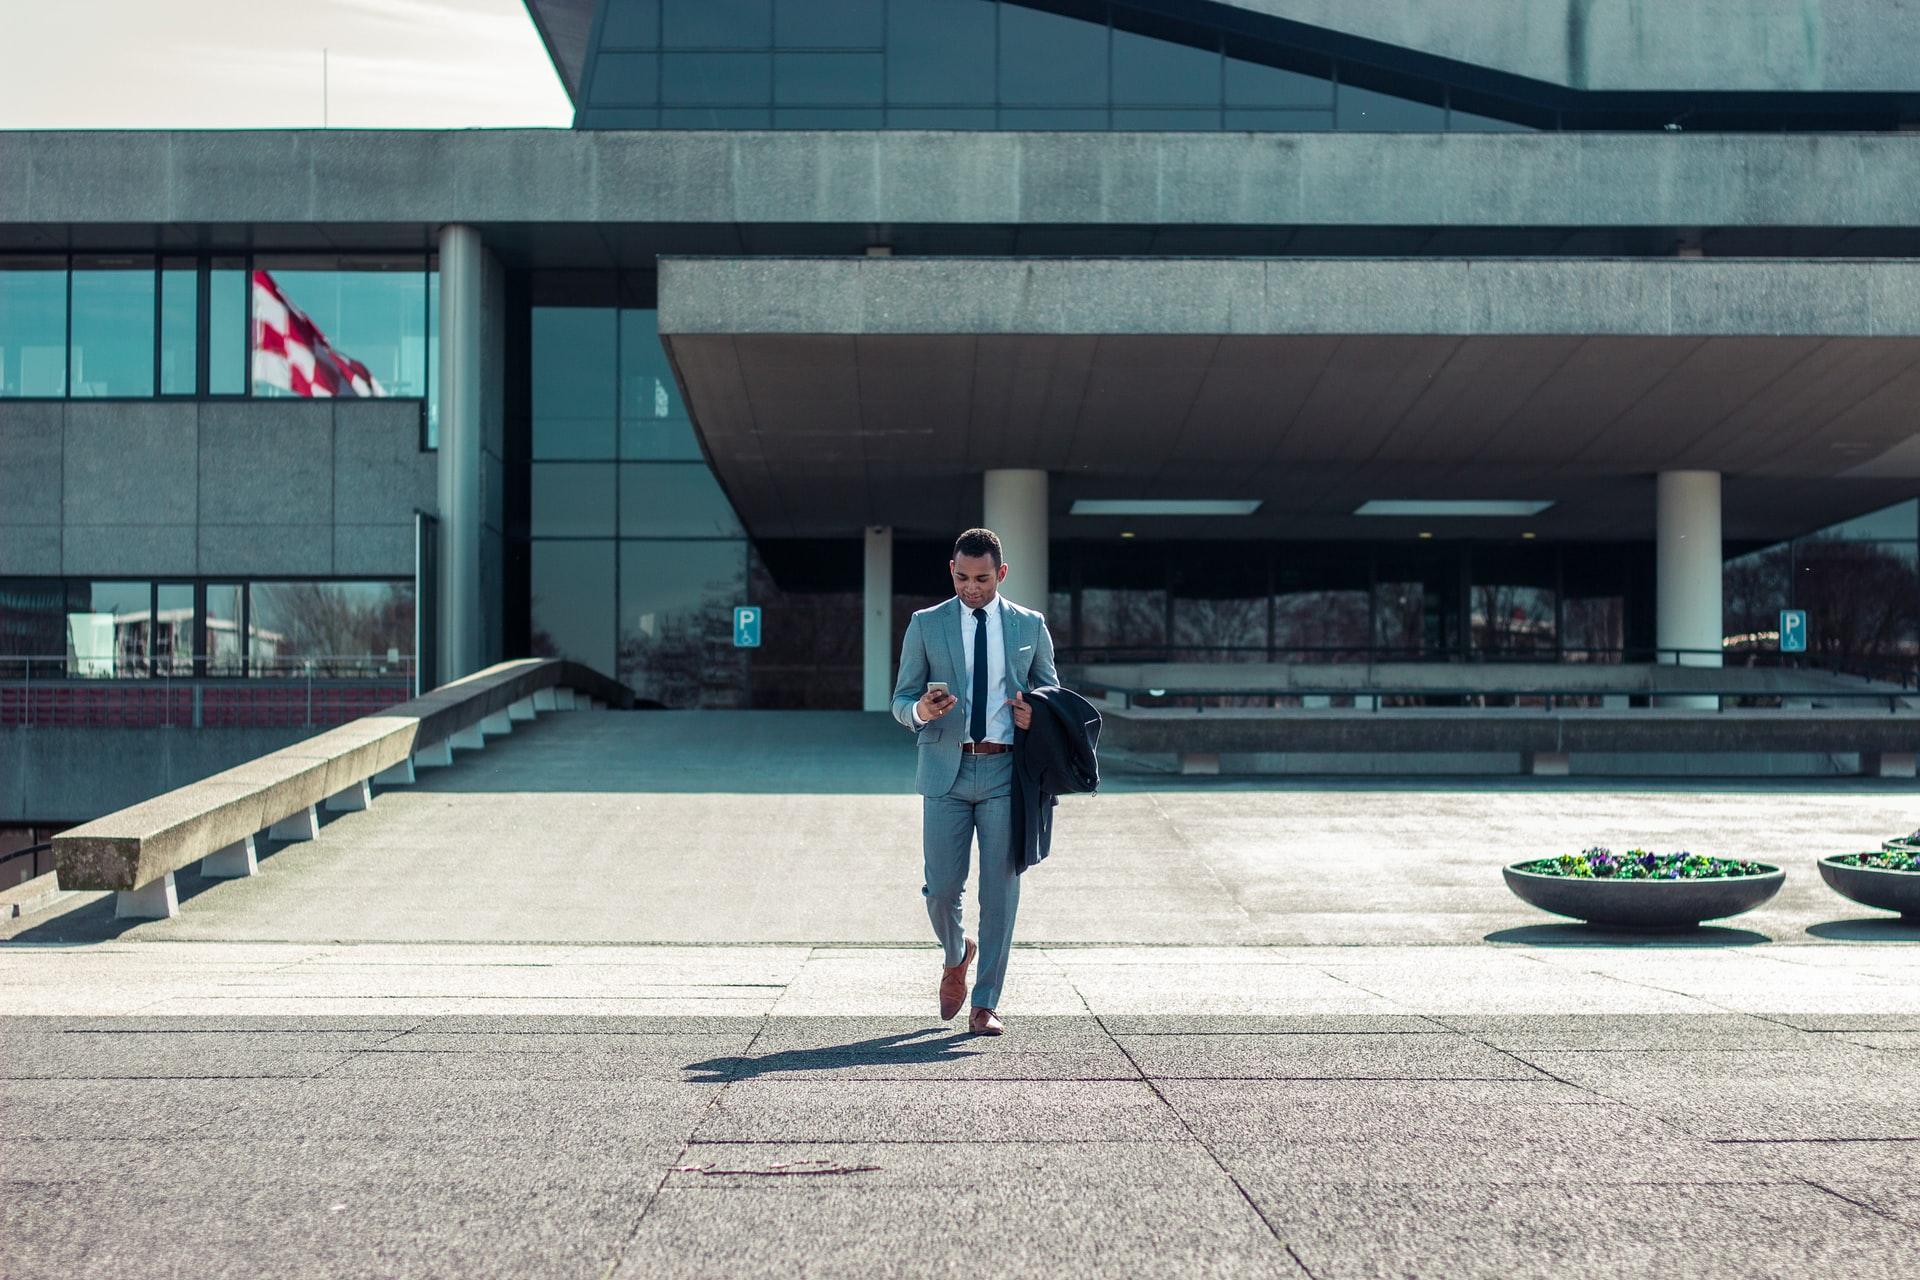 Effects of International Marketing Environments on Entrepreneurship